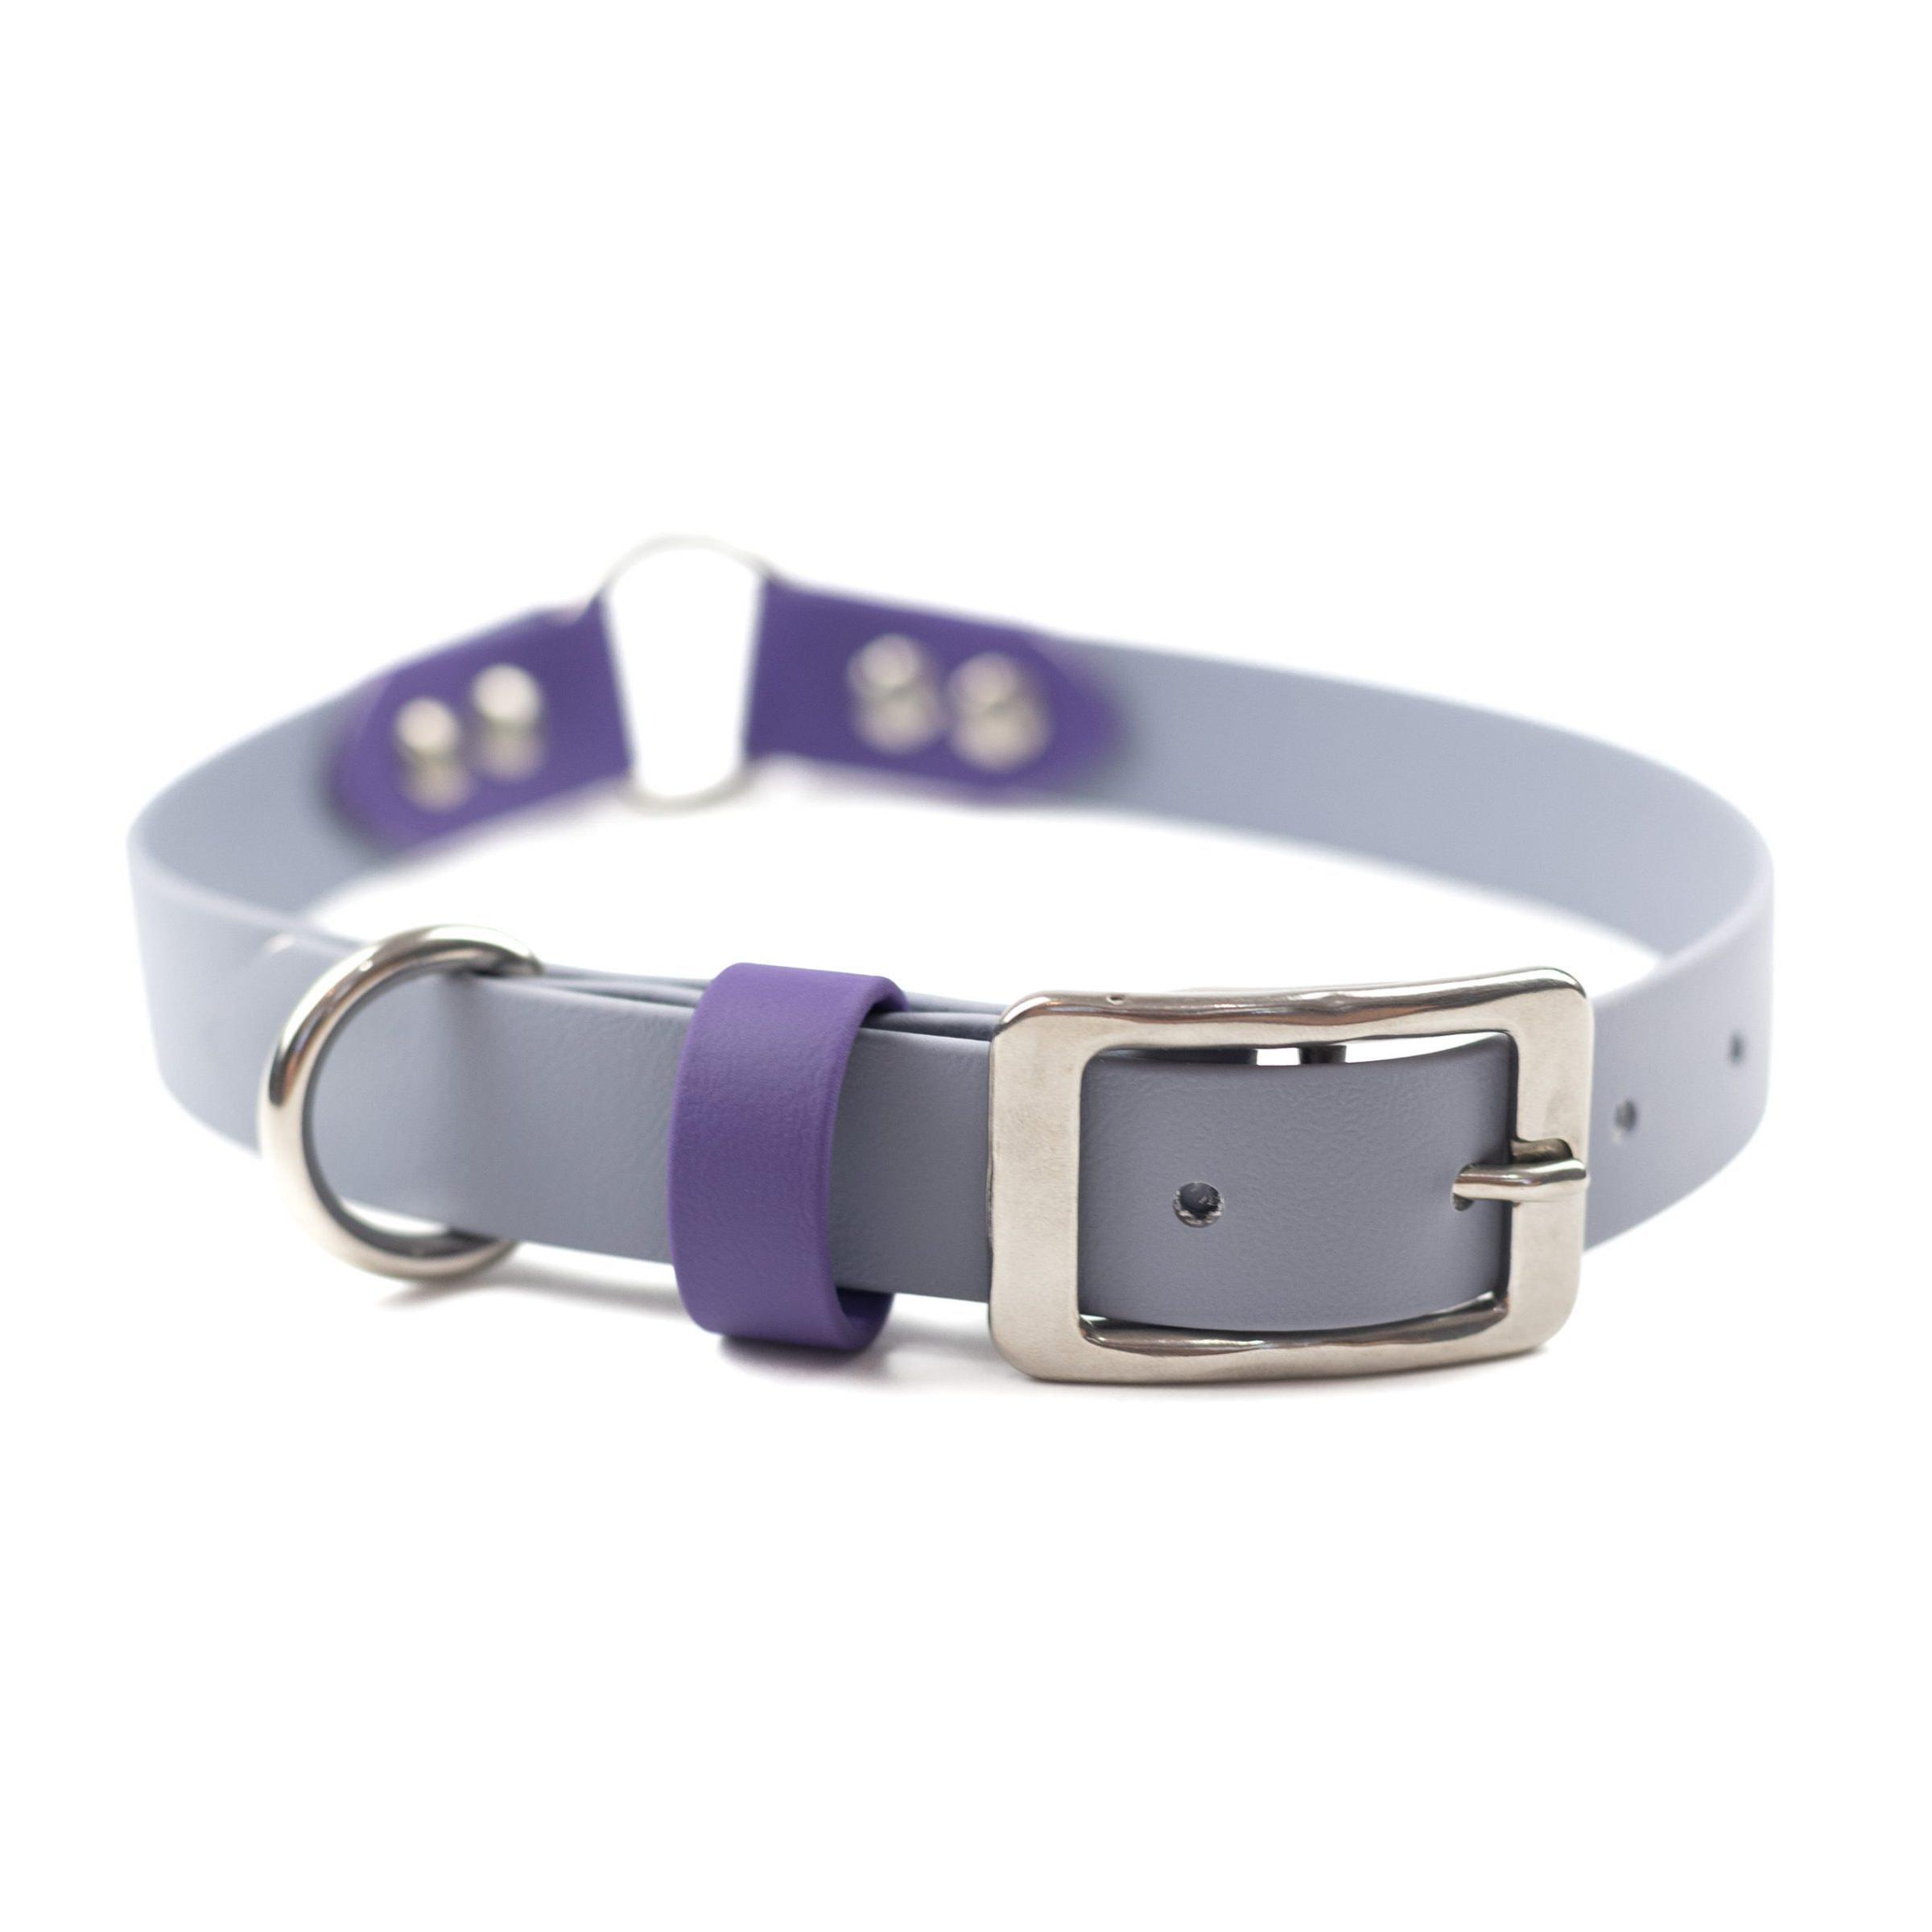 Grey, purple stainless steel o ring collar